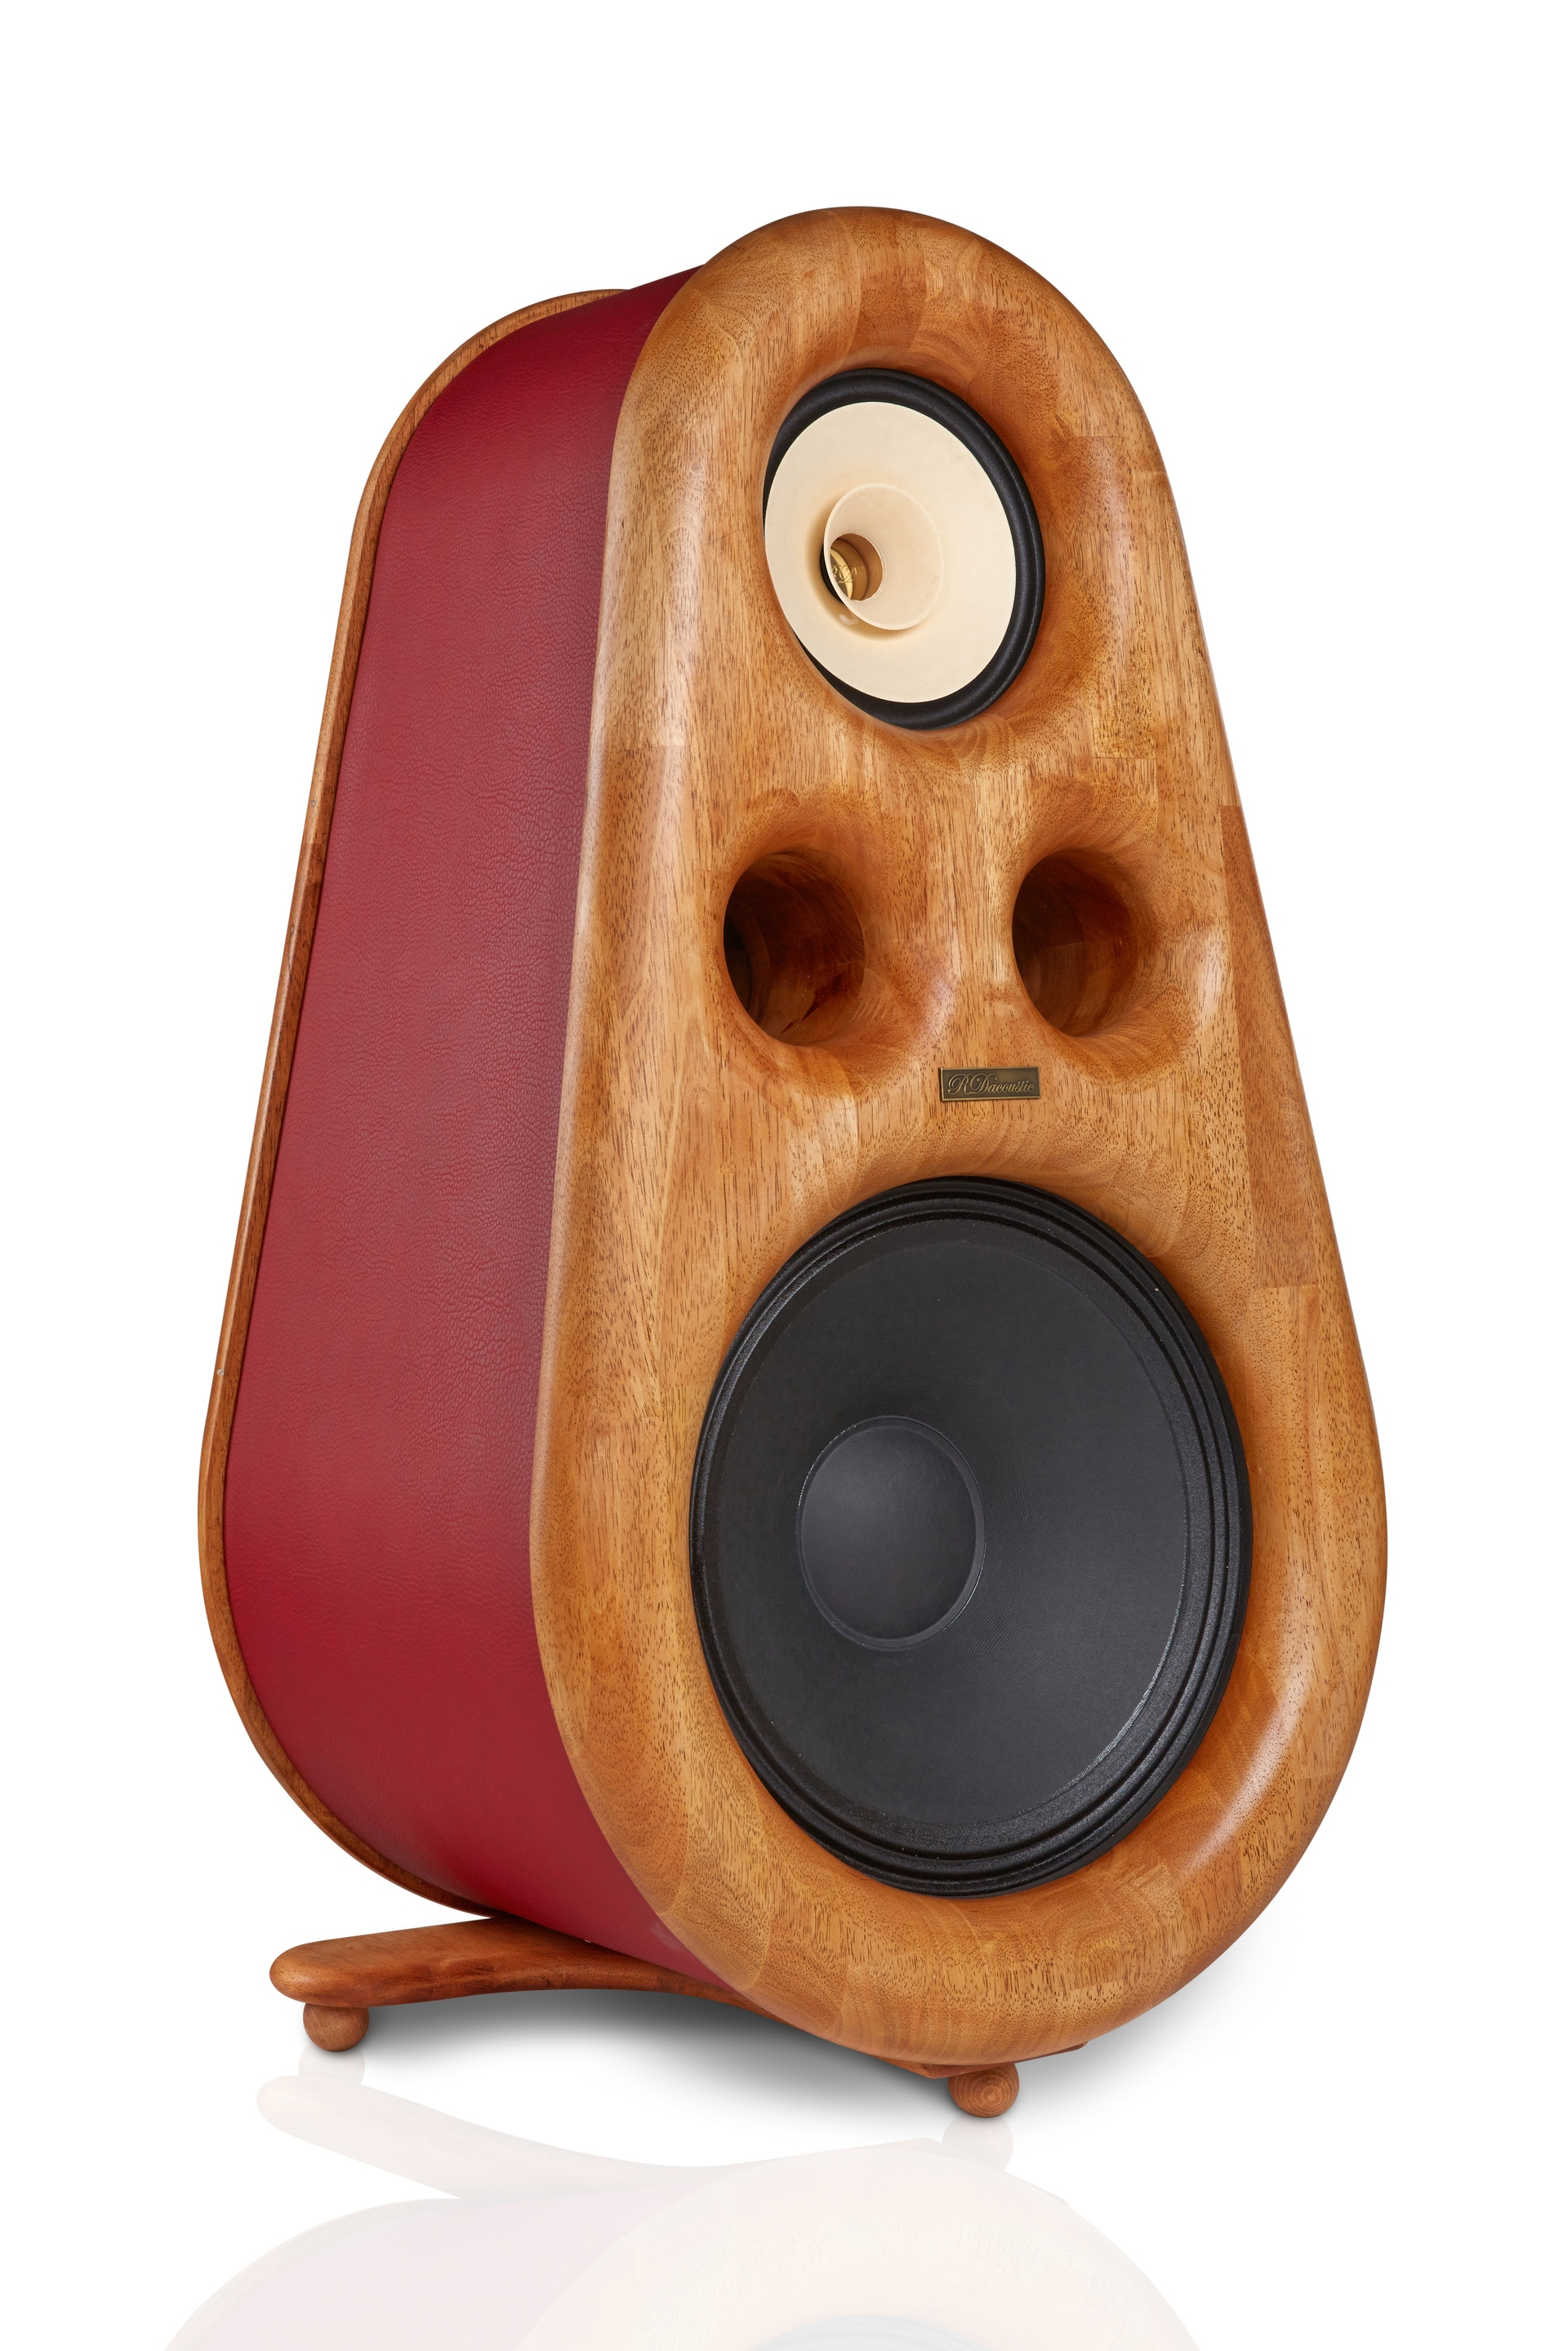 Reproduktorové soustavy Euphoria RDacoustic stereo 2.0 surround 7.1, 5.1